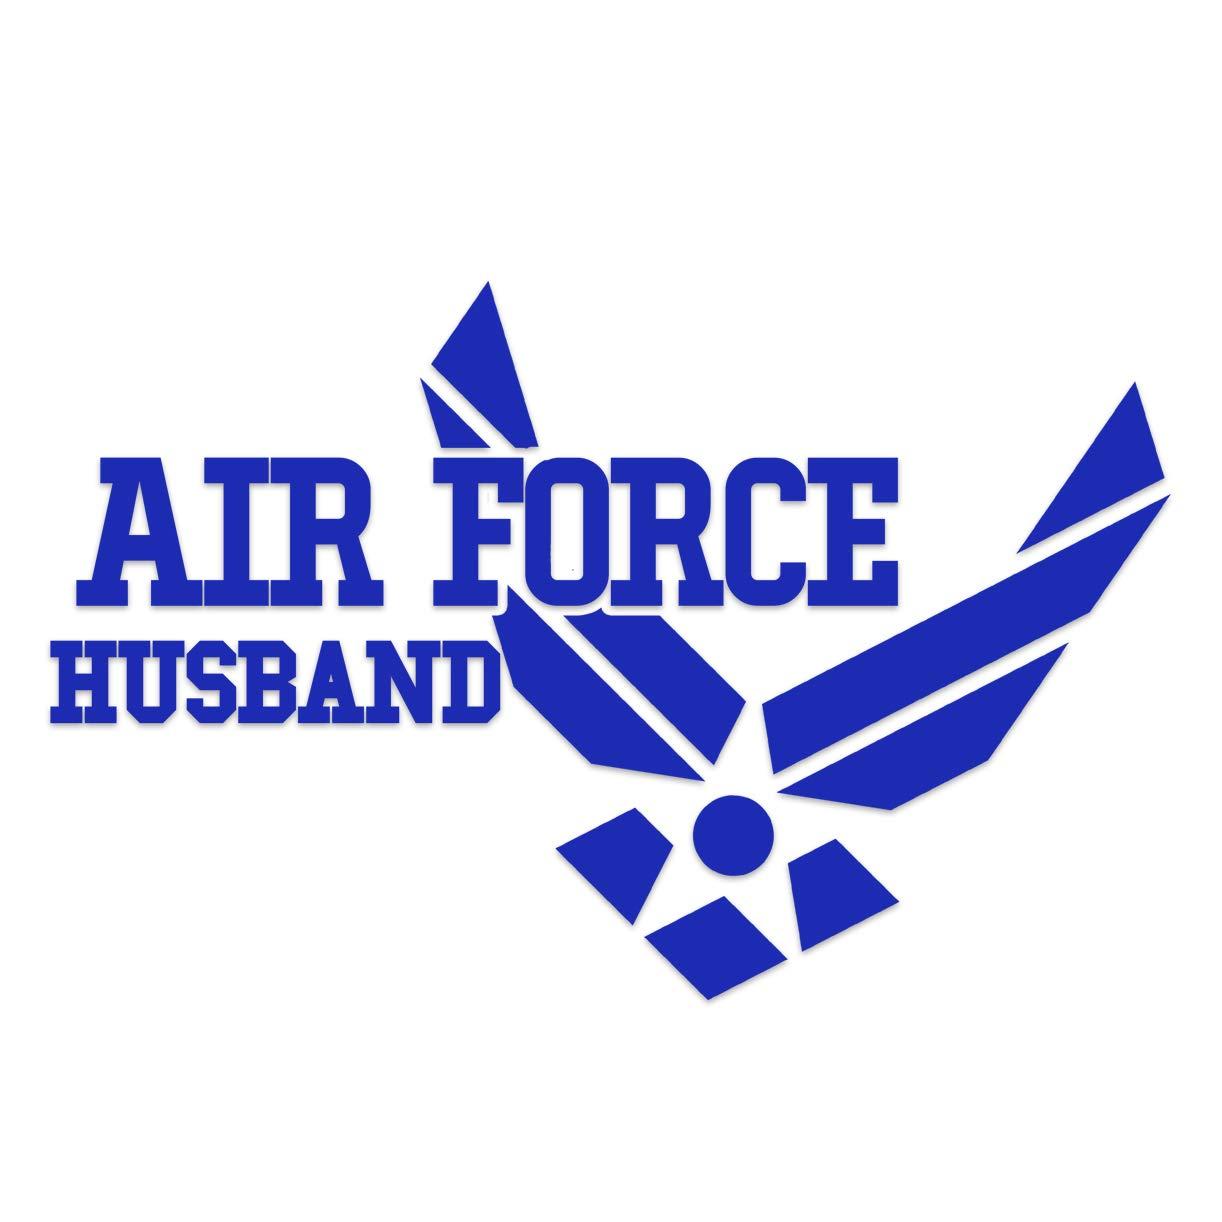 Car Decal Air Force Husband Vinyl Sticker Decal Laptop Decal